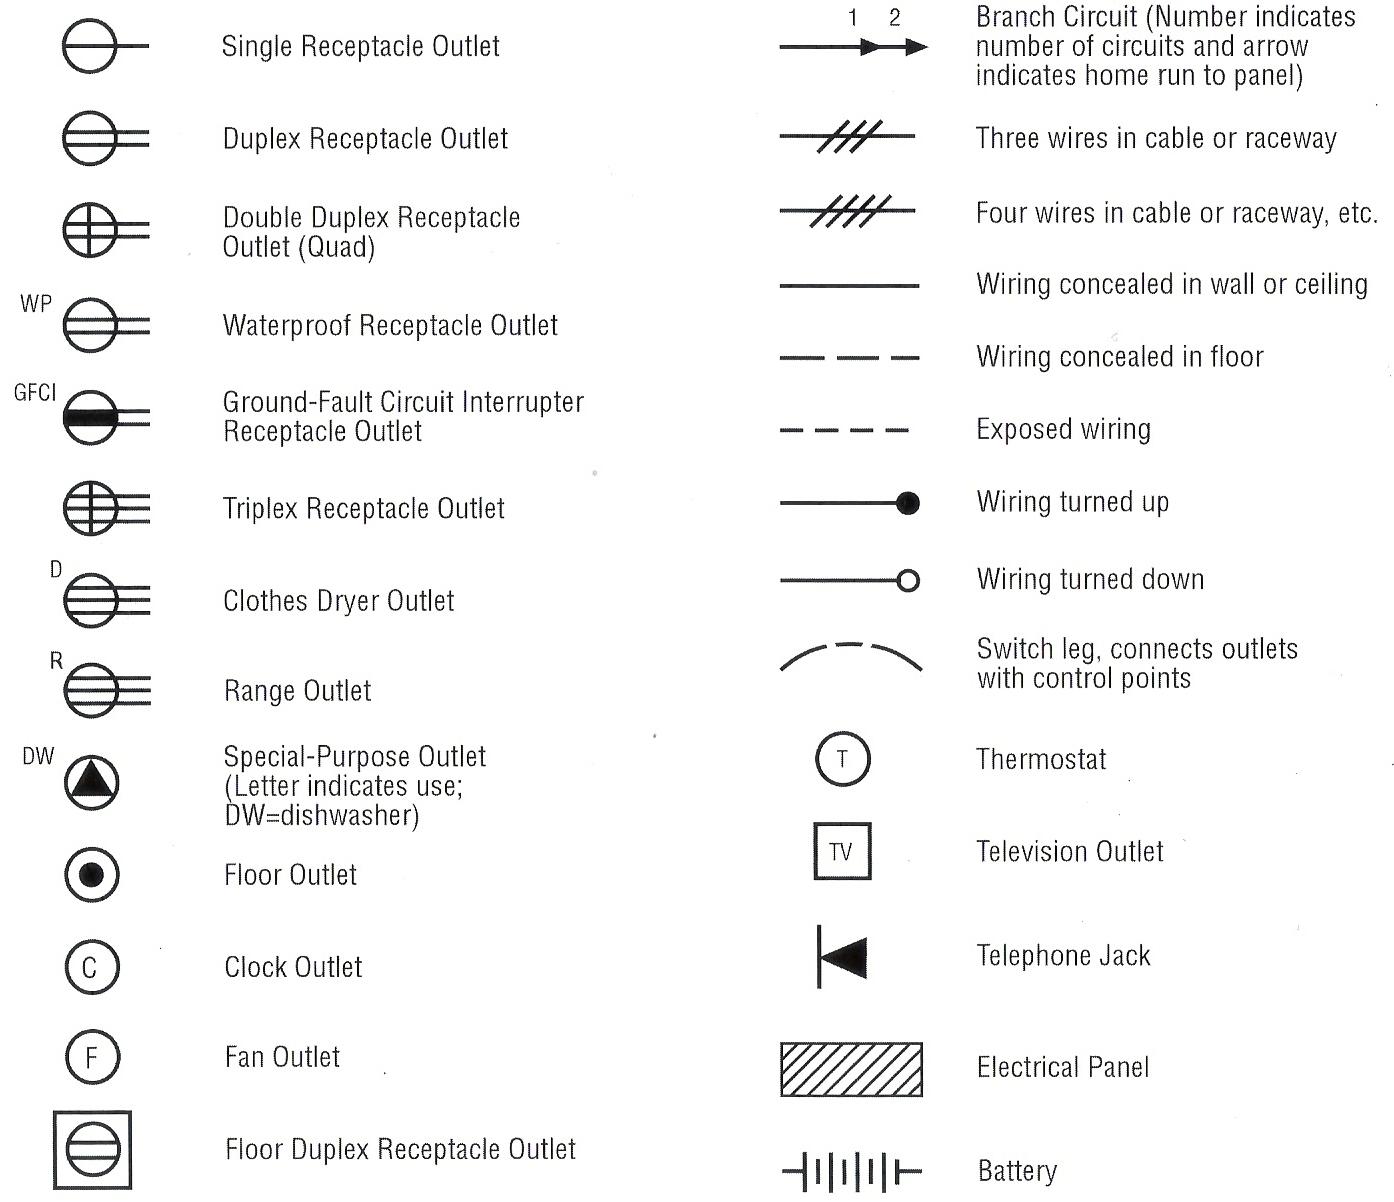 Electrical Wiring Diagram Symbols Ppt Danfoss Room Stat European Schematic Get Free Image